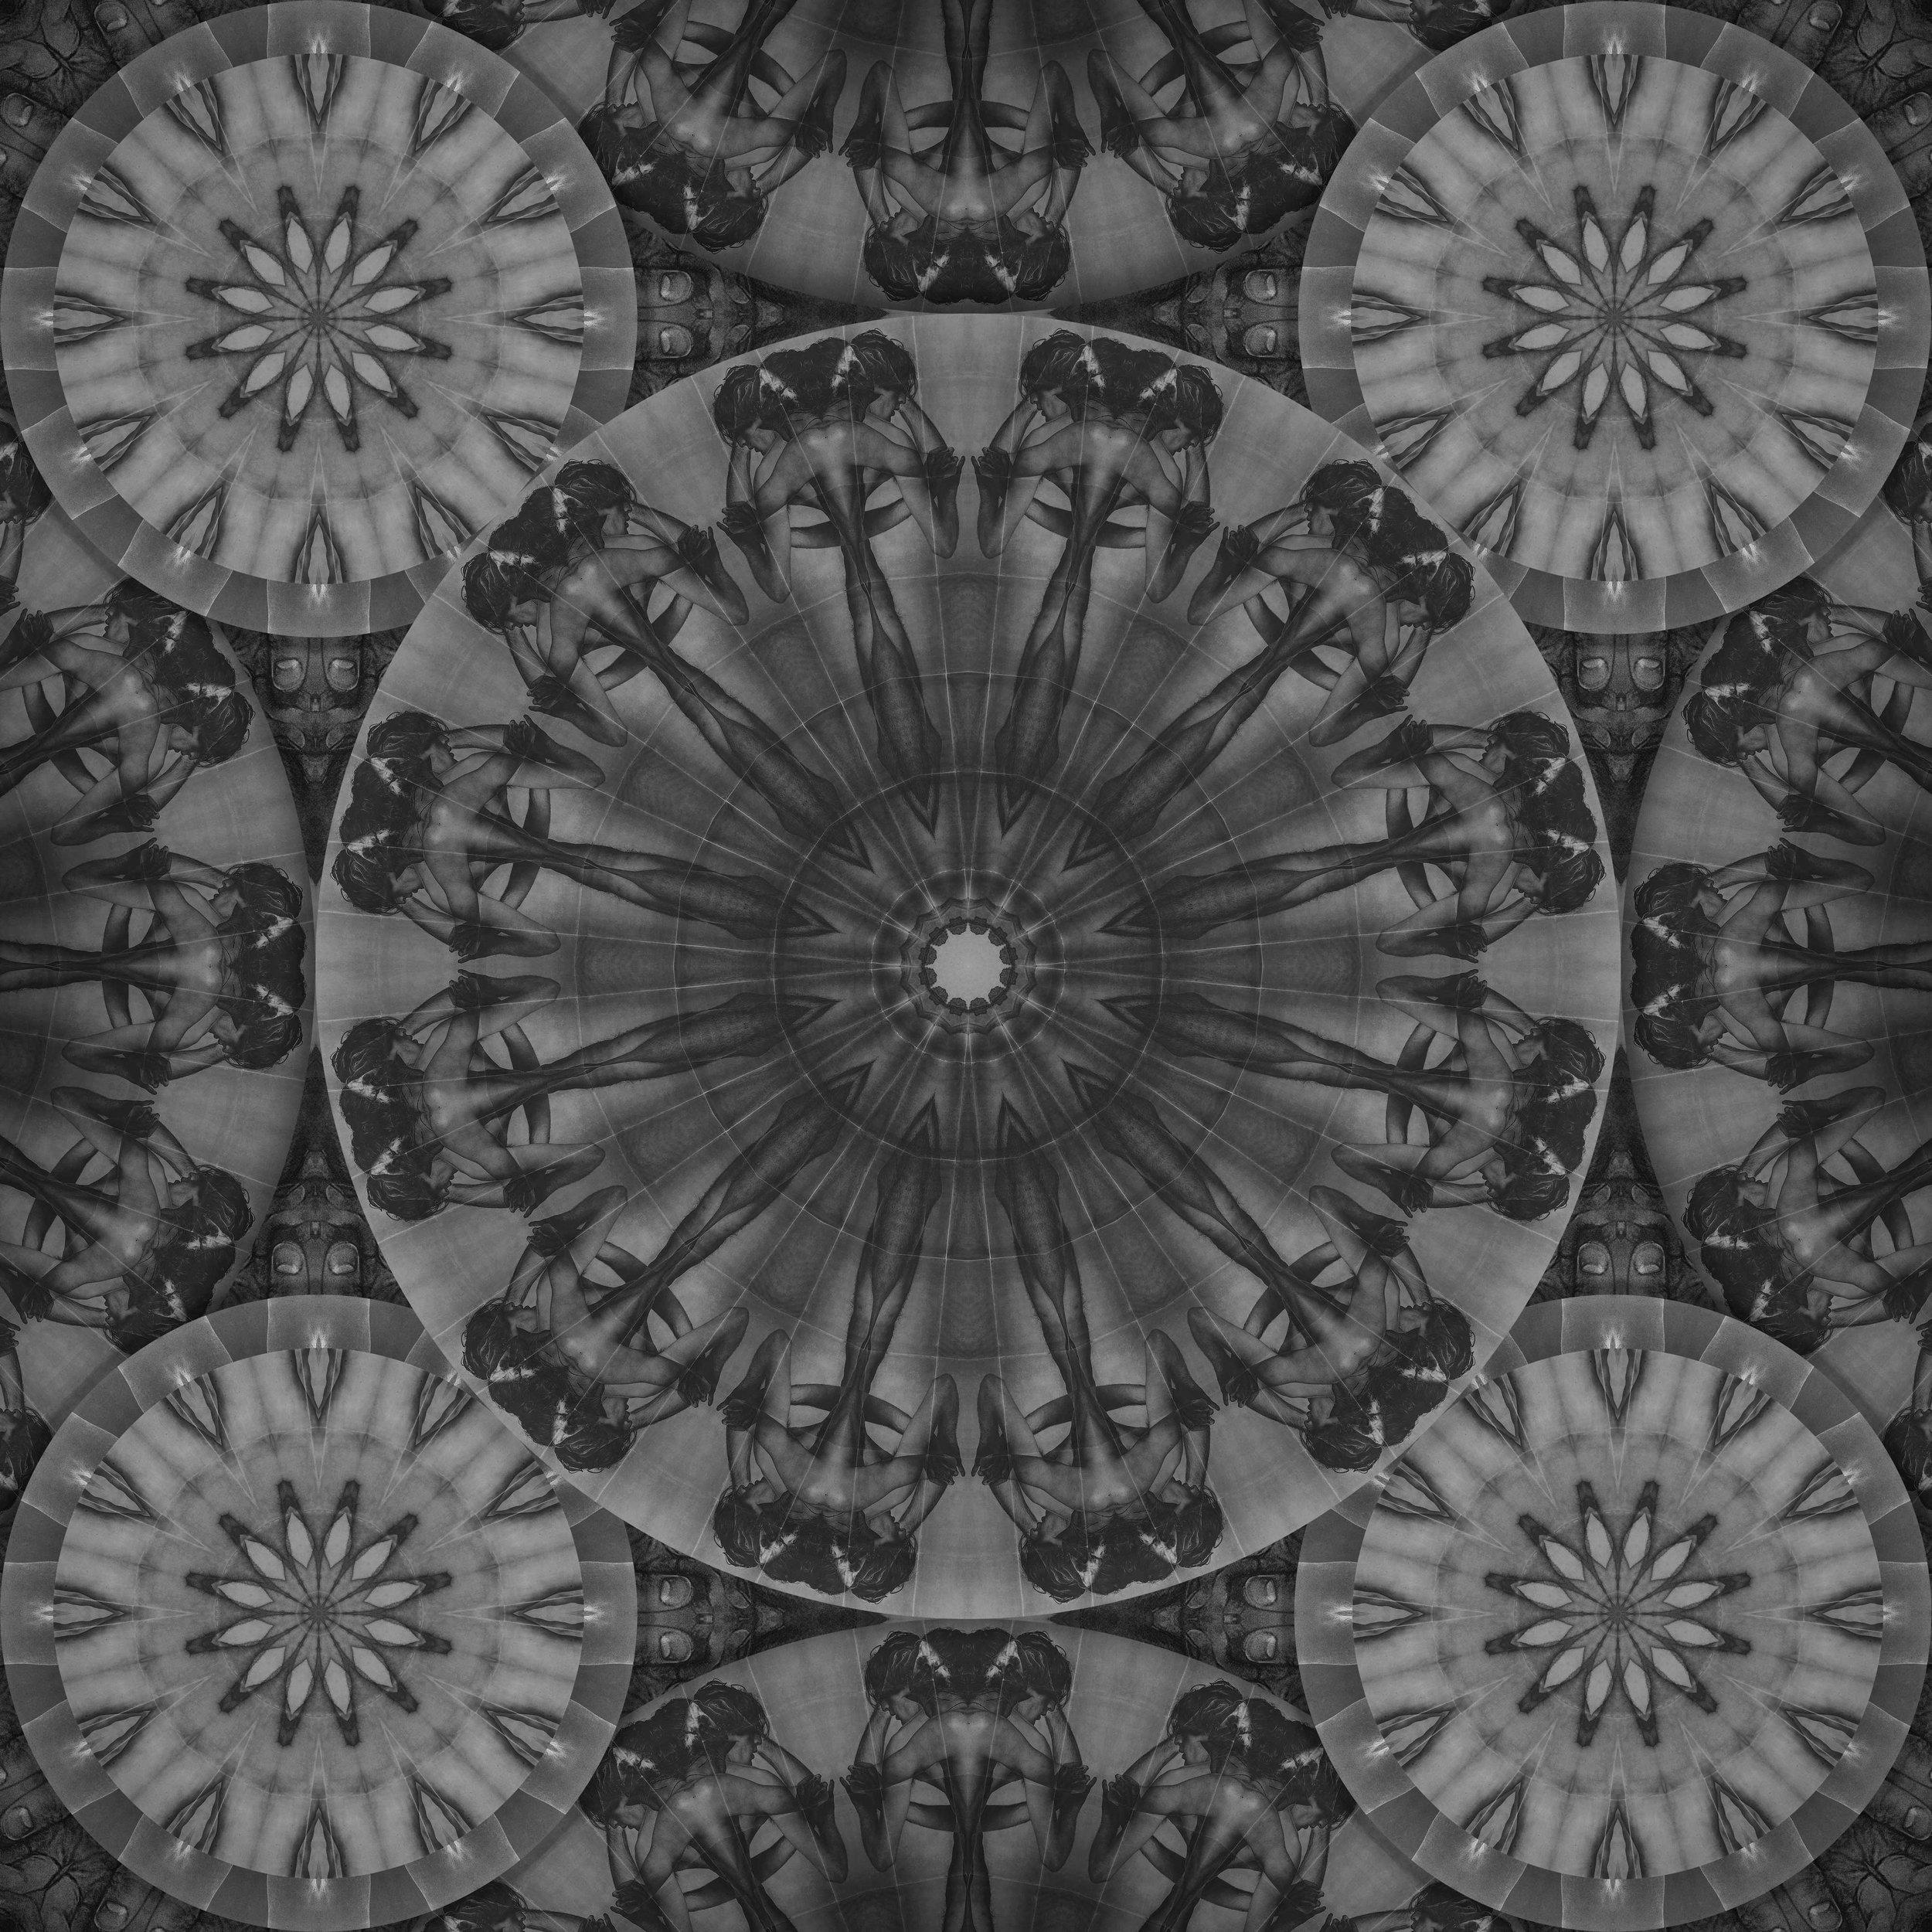 Large_Left_Mandala_70x70.jpg